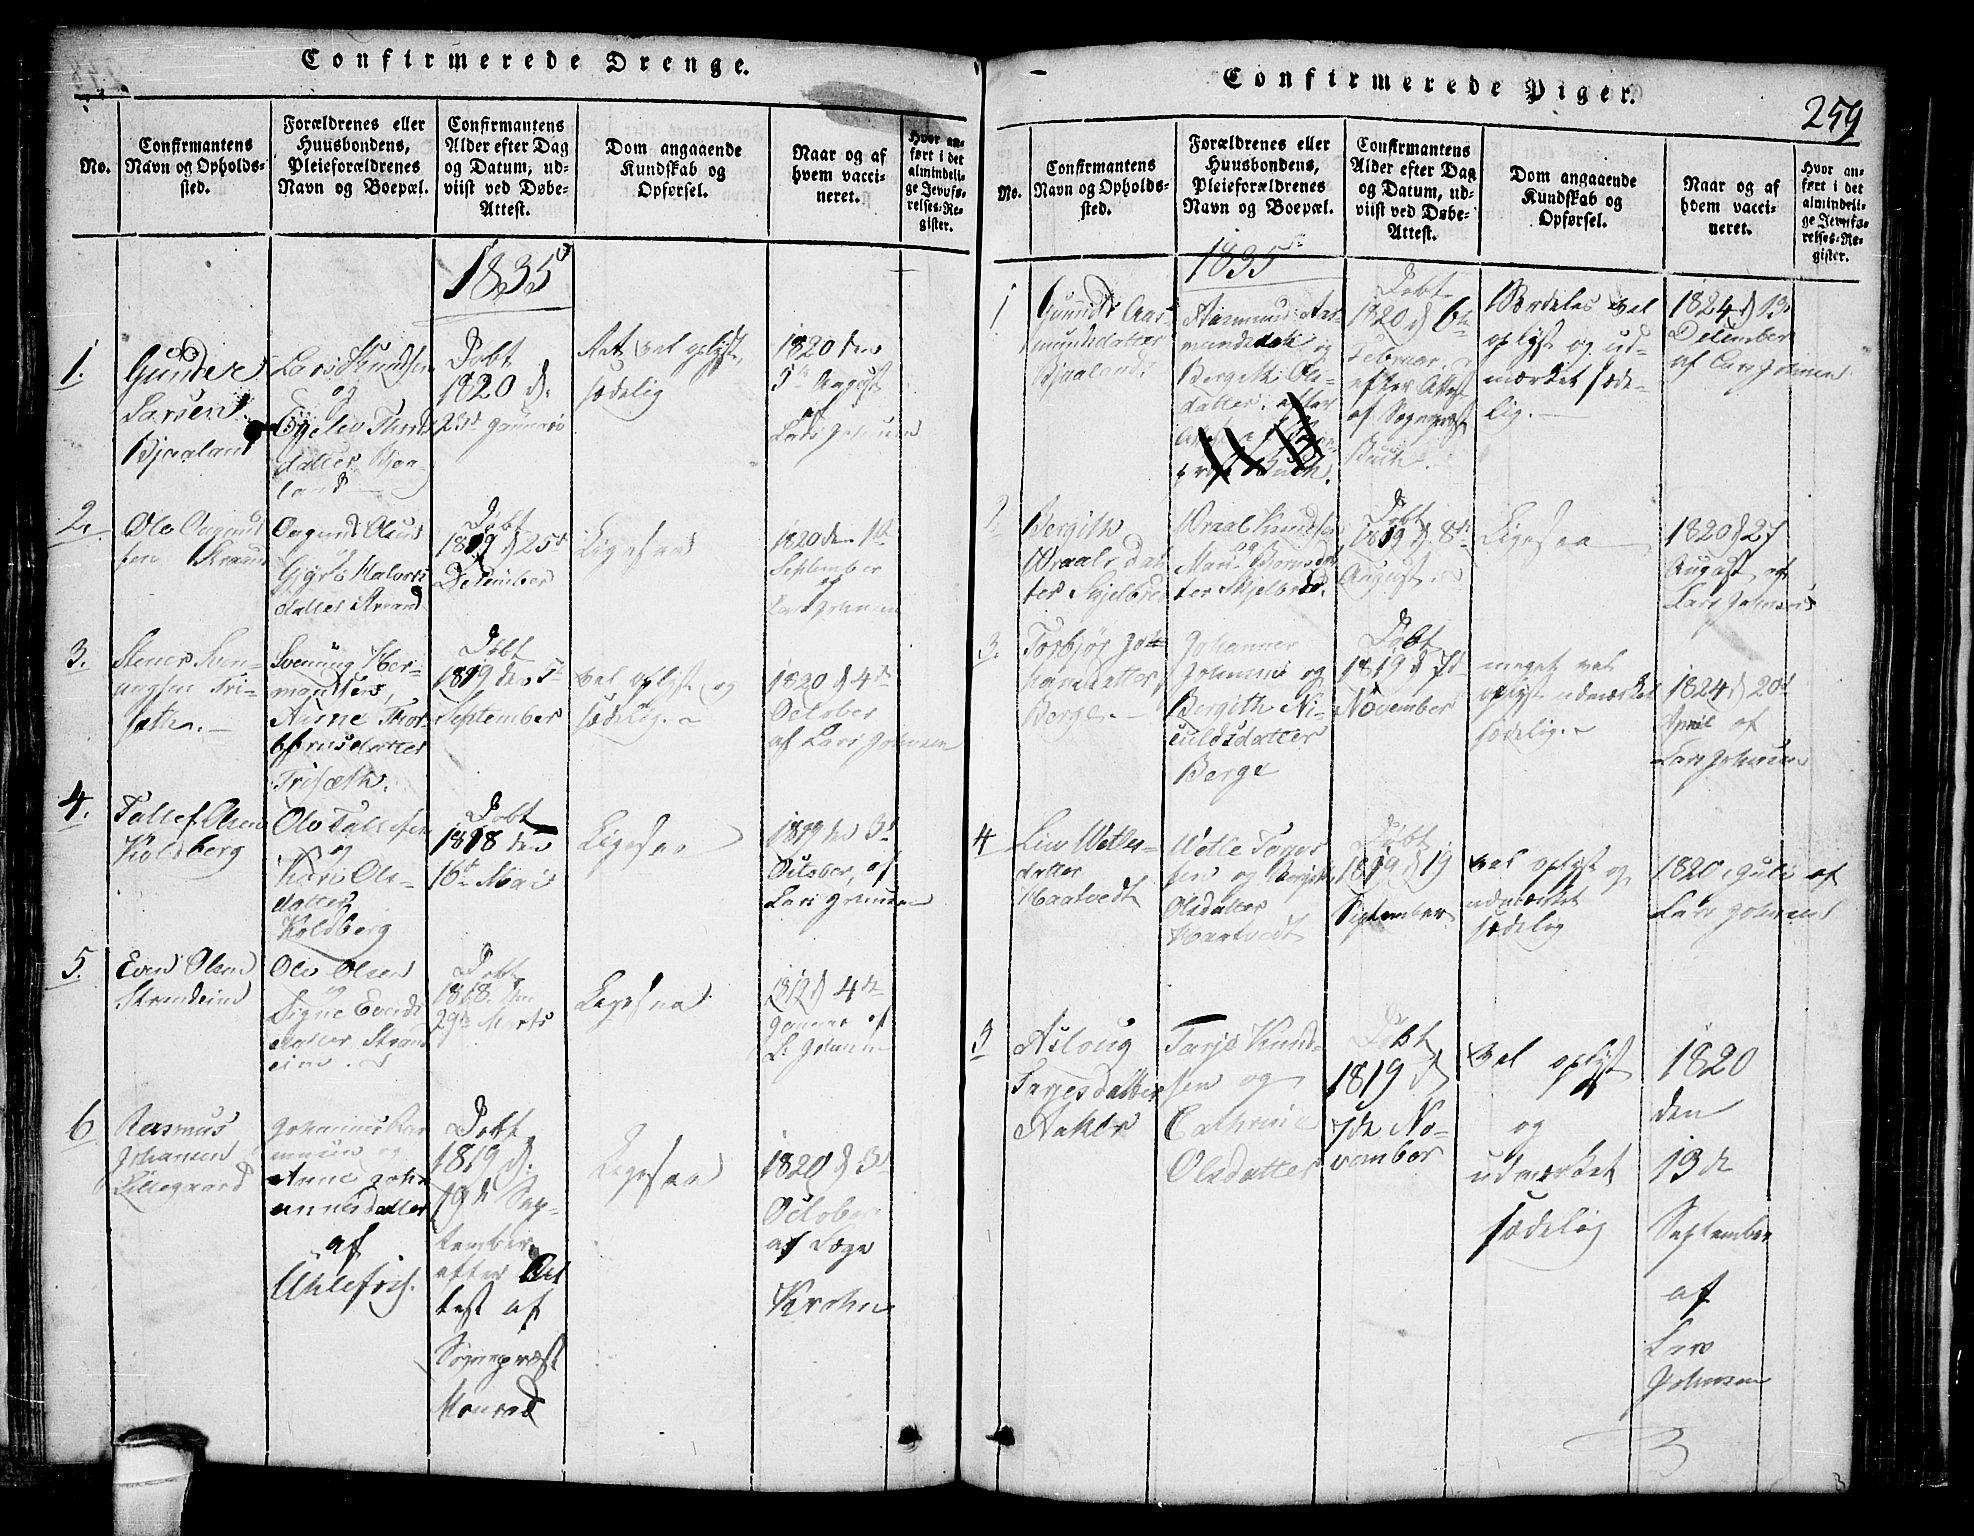 SAKO, Lårdal kirkebøker, G/Ga/L0001: Klokkerbok nr. I 1, 1815-1861, s. 259